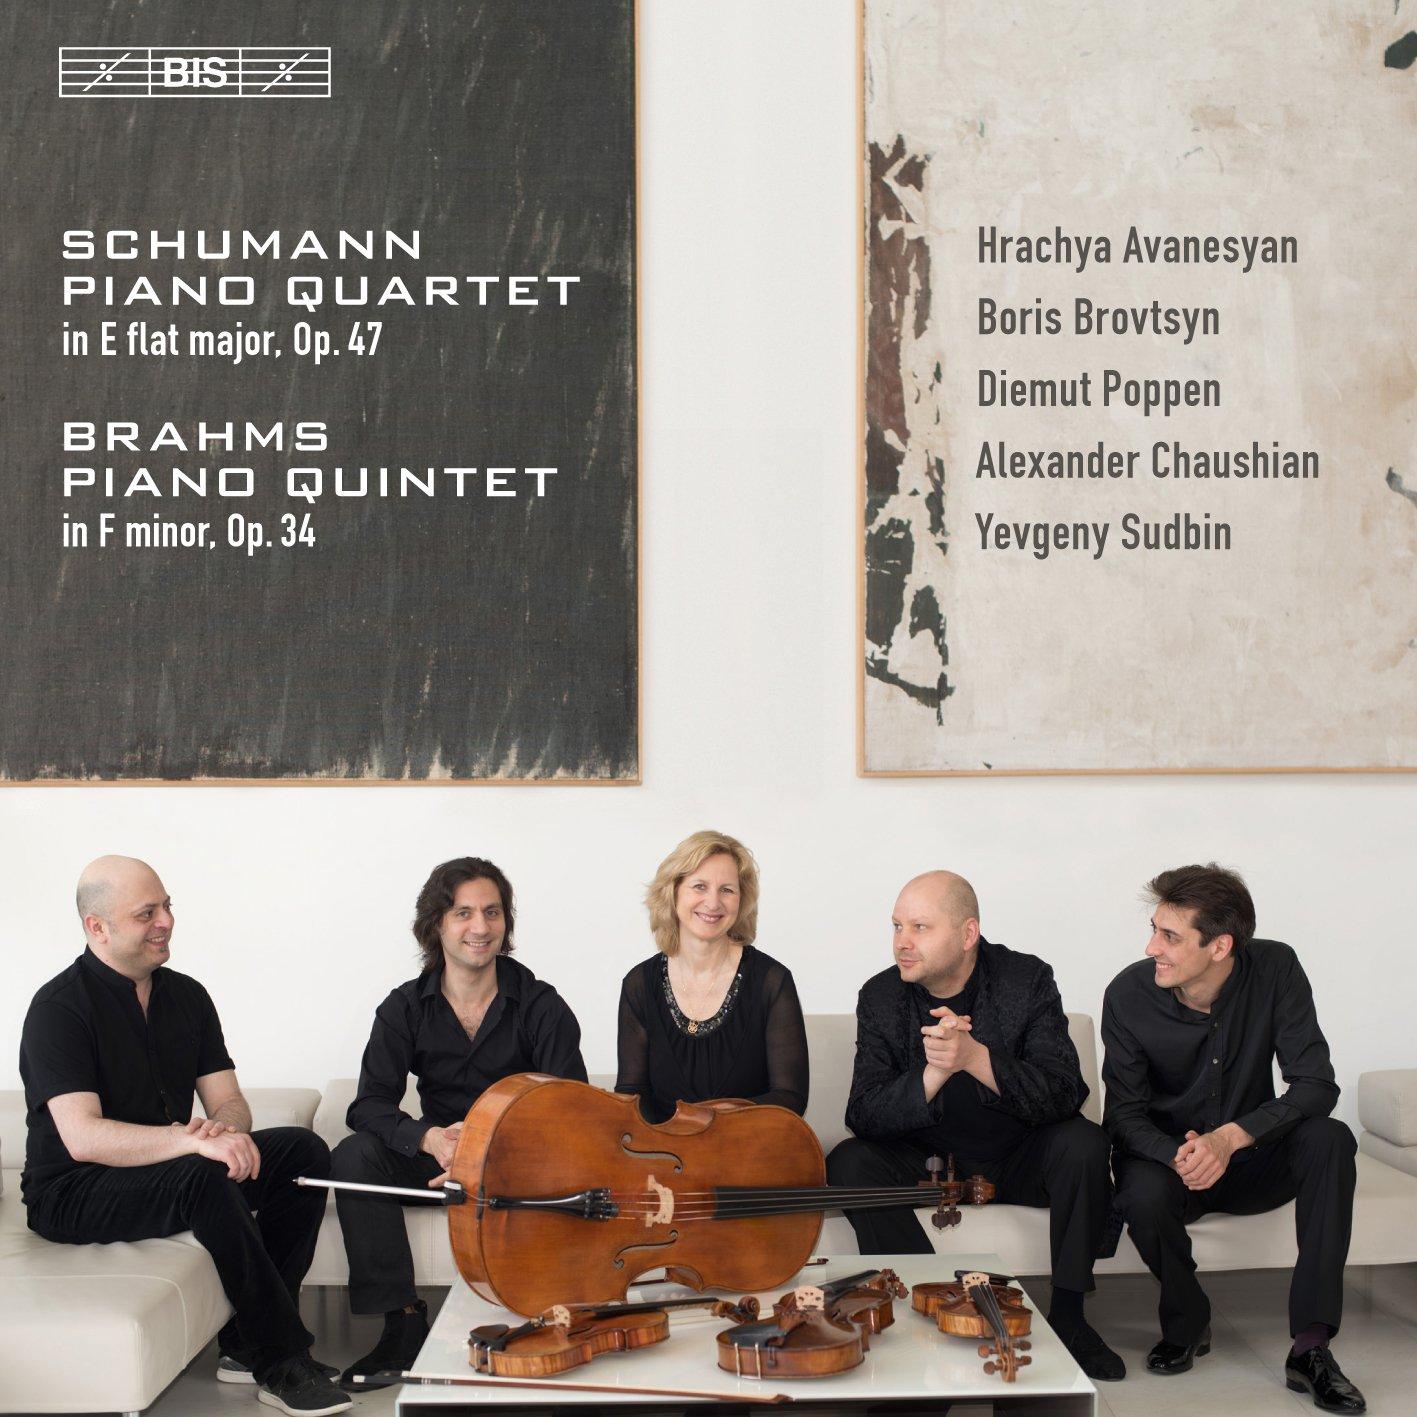 SACD : Brahms / Sudbin / Chaushian - Piano Quartet 47 / Piano Quintet 34 (Hybrid SACD)